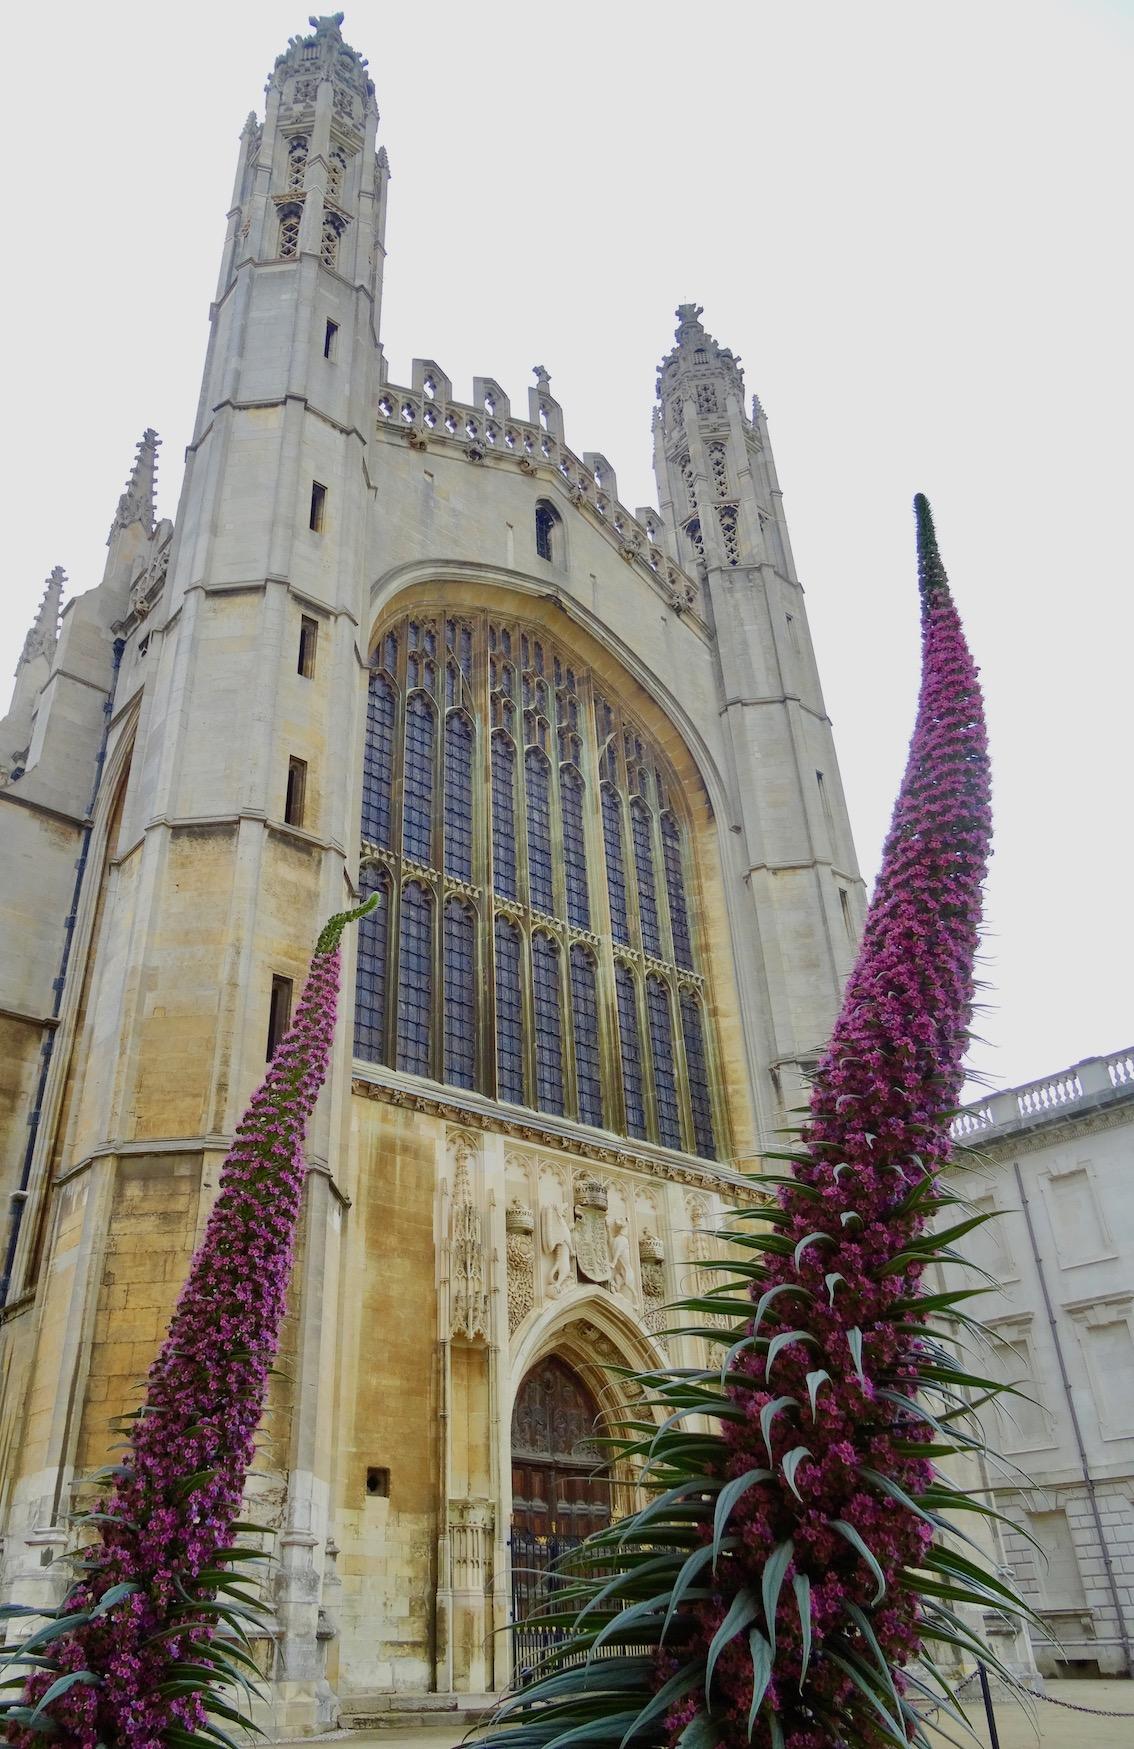 King's College Chapel Cambridge England.